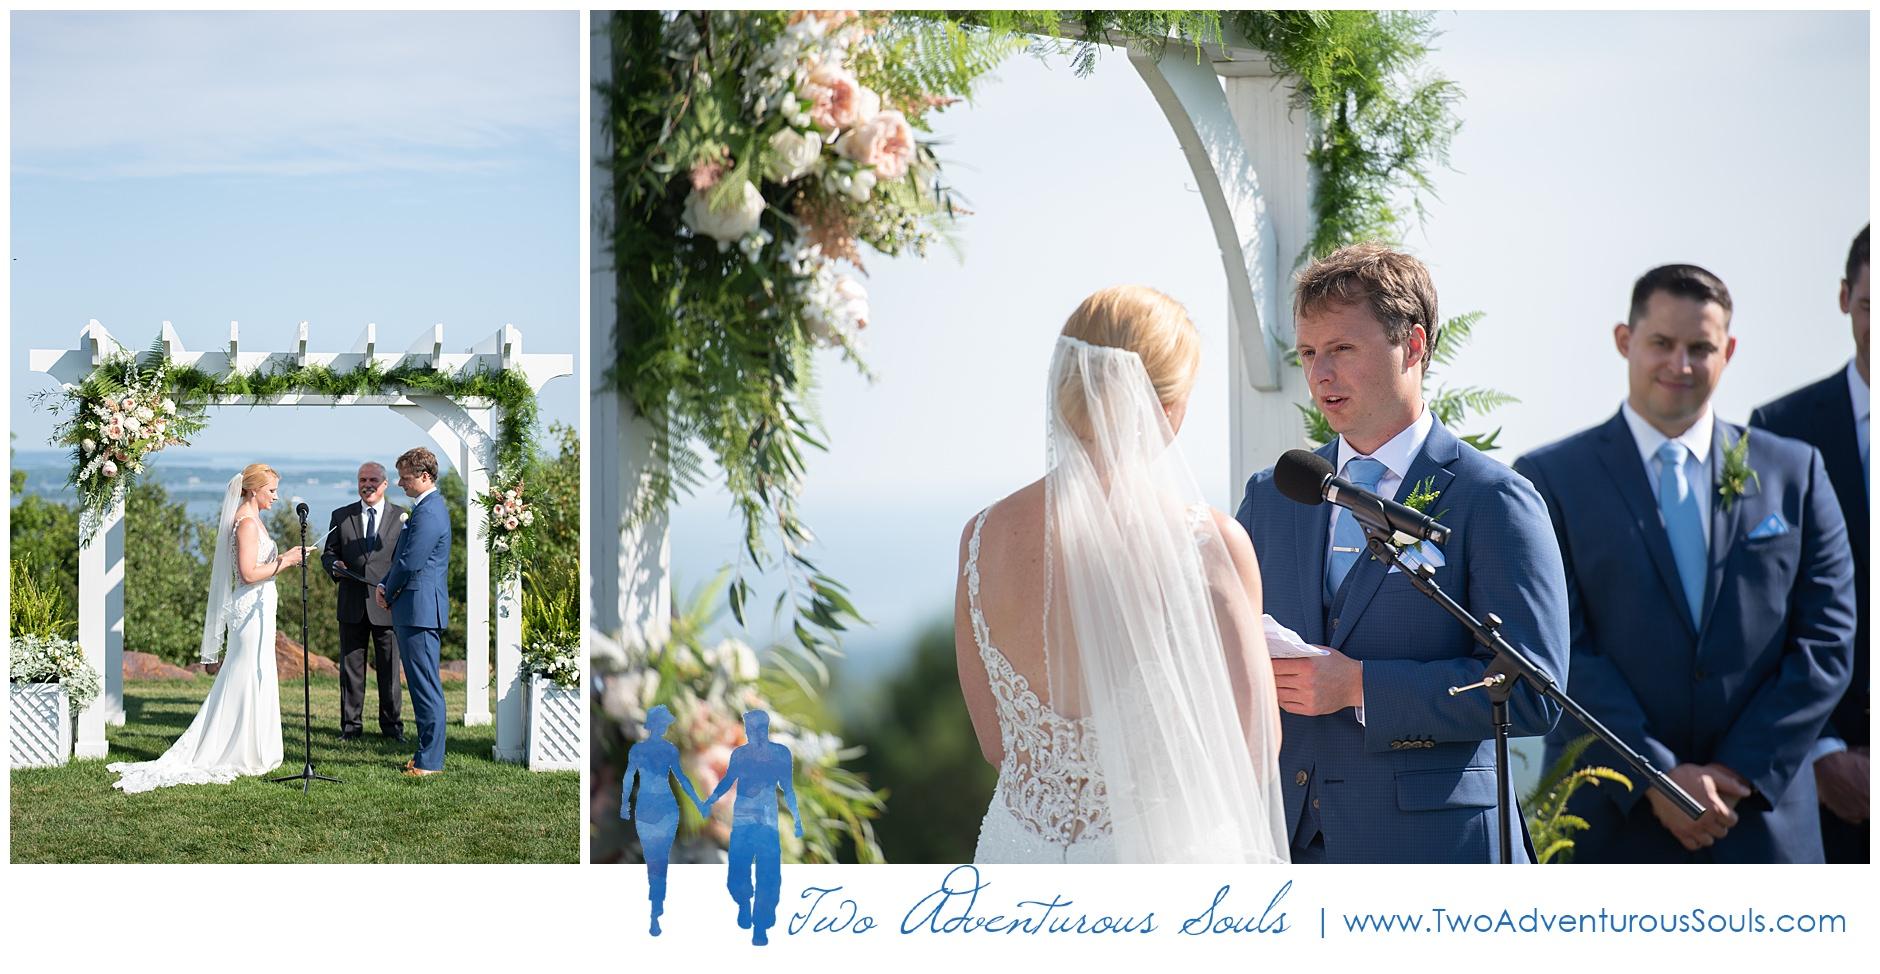 Maine Wedding Photographers, Point Lookout Wedding Photographers, Maine Elopement Photographers, Two Adventurous Souls-0080419_0040.jpg